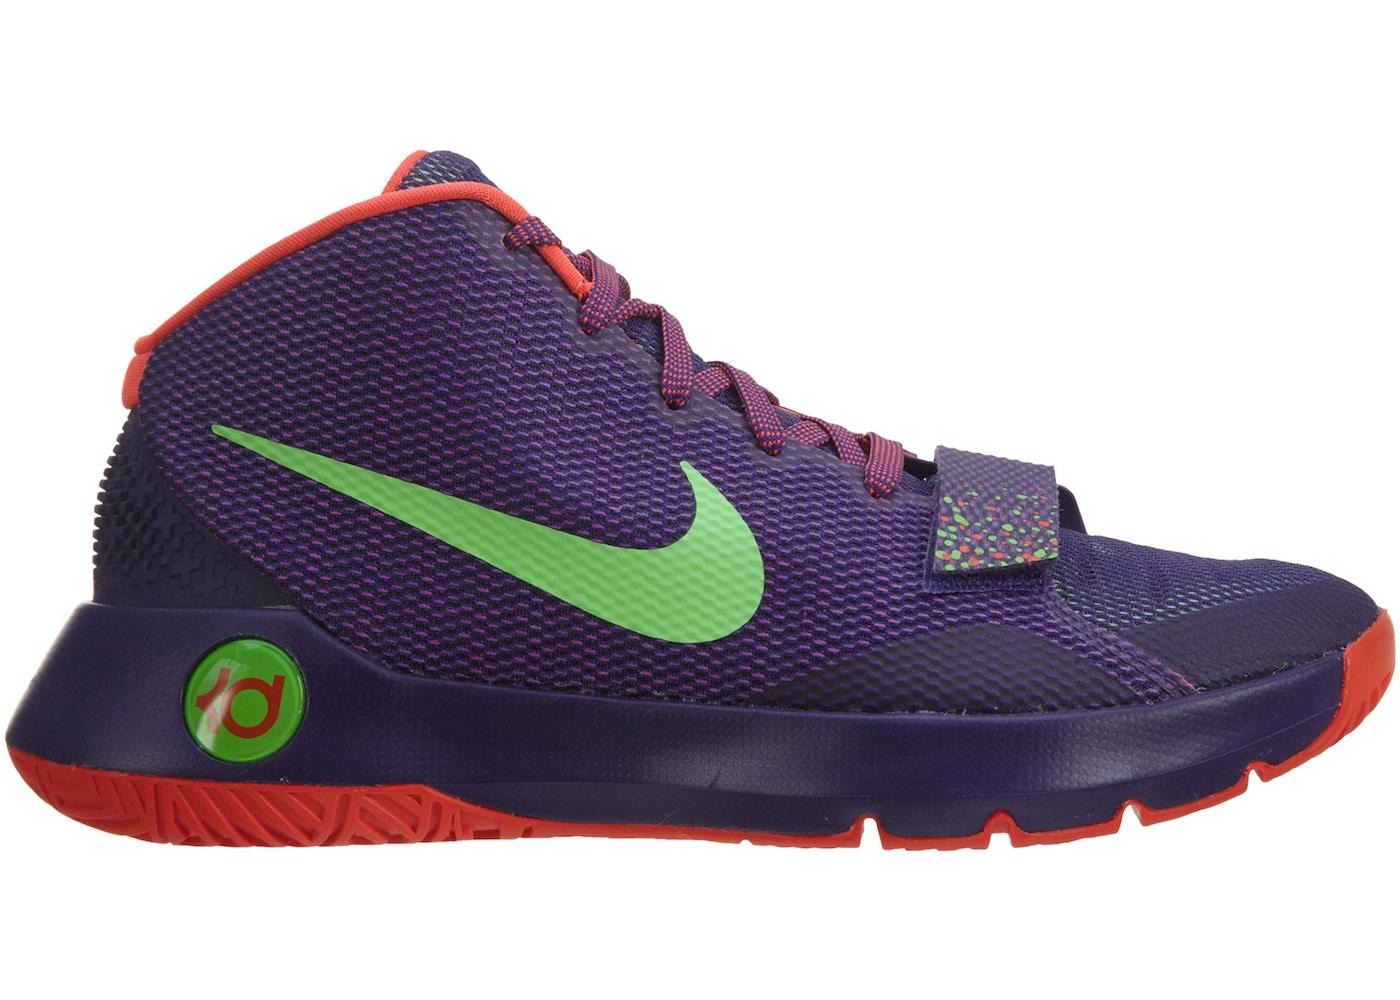 ce704a2770cc3 Nike Kd Trey 5 Iii Court Purple   Green Strike-Bright Crimson ...